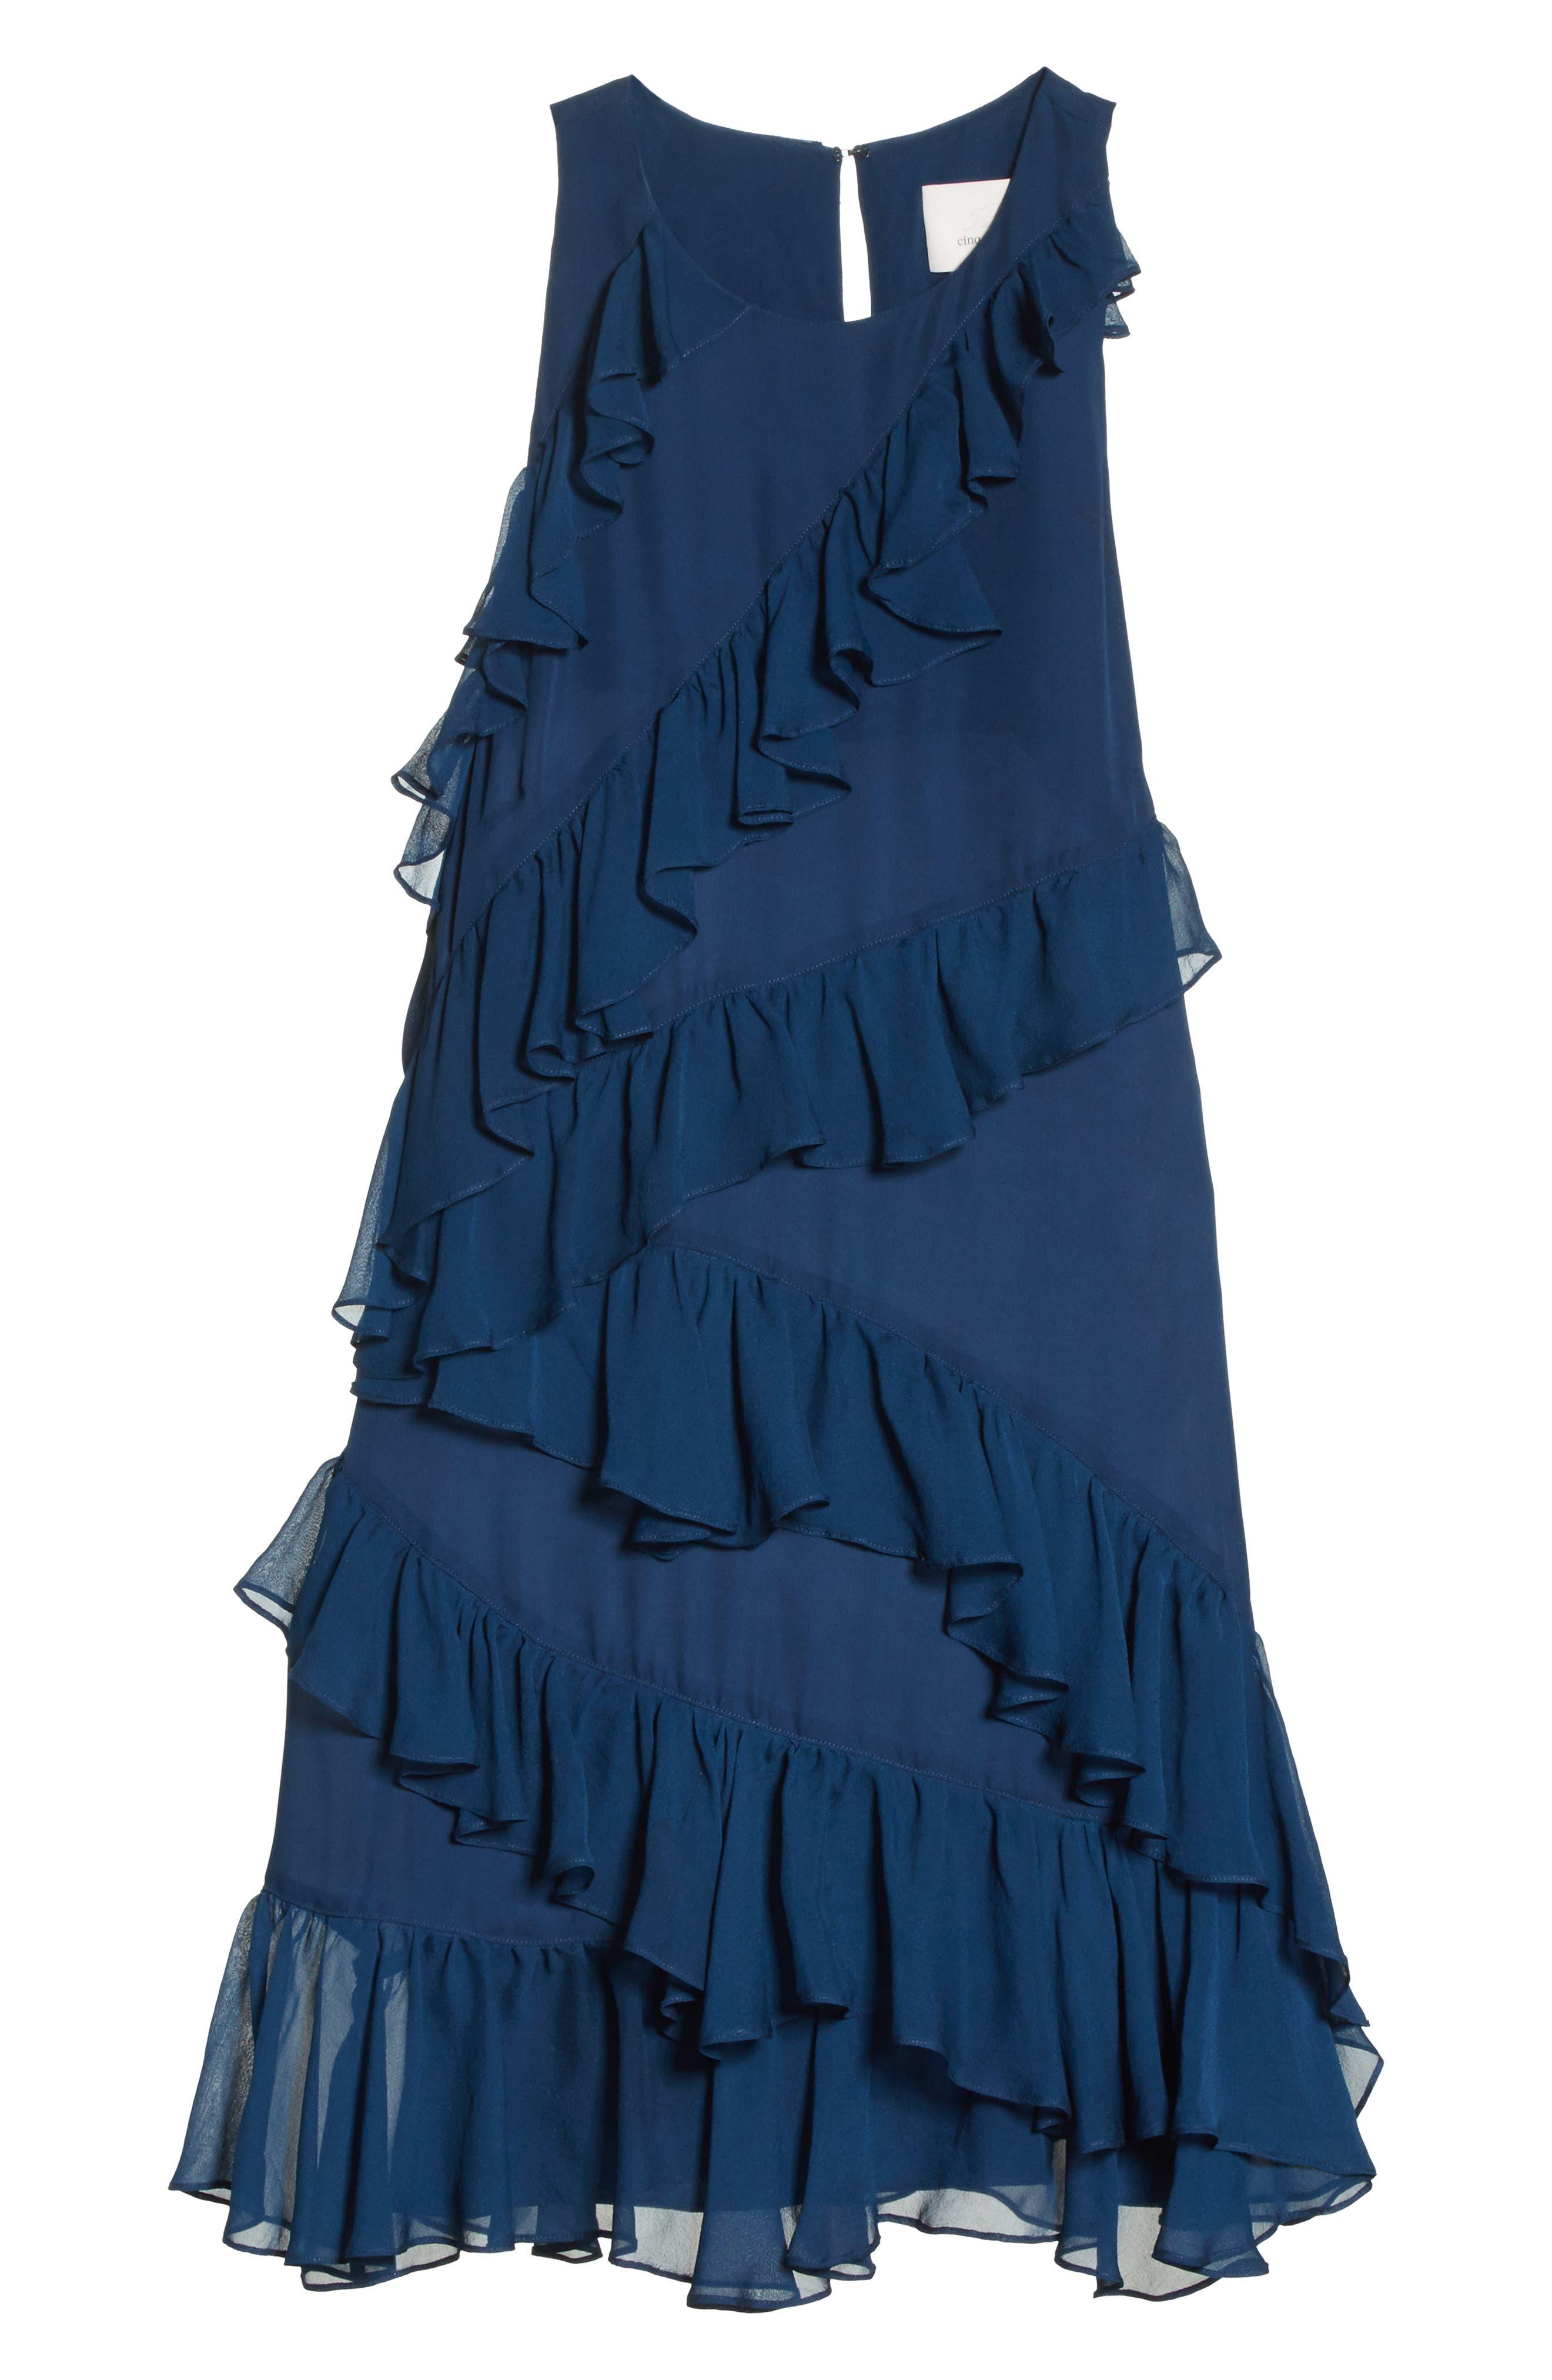 Taghrid Ruffle Silk Dress,                             Alternate thumbnail 6, color,                             Lapis